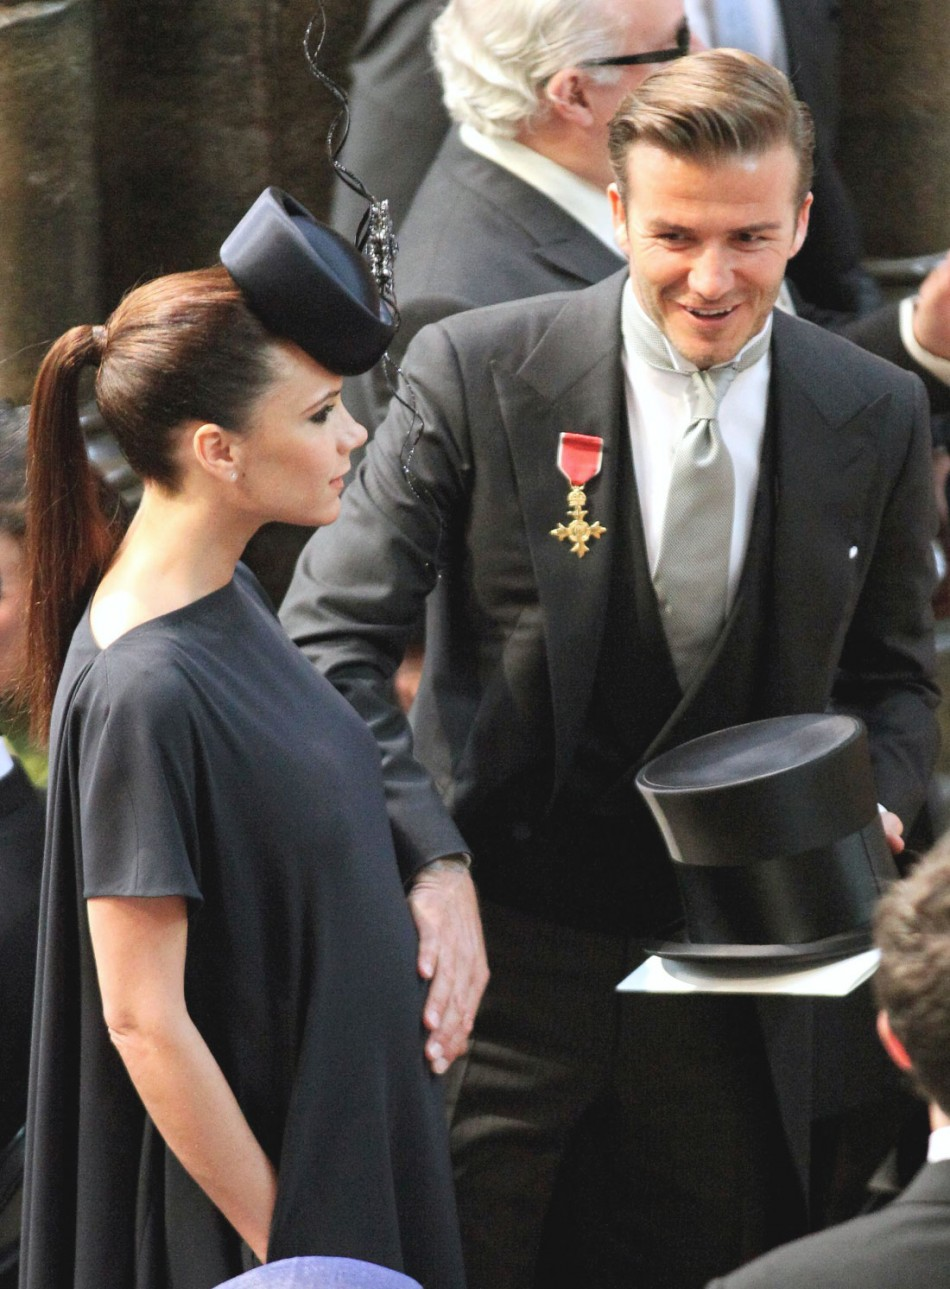 Royal Wedding Guests' Fashion